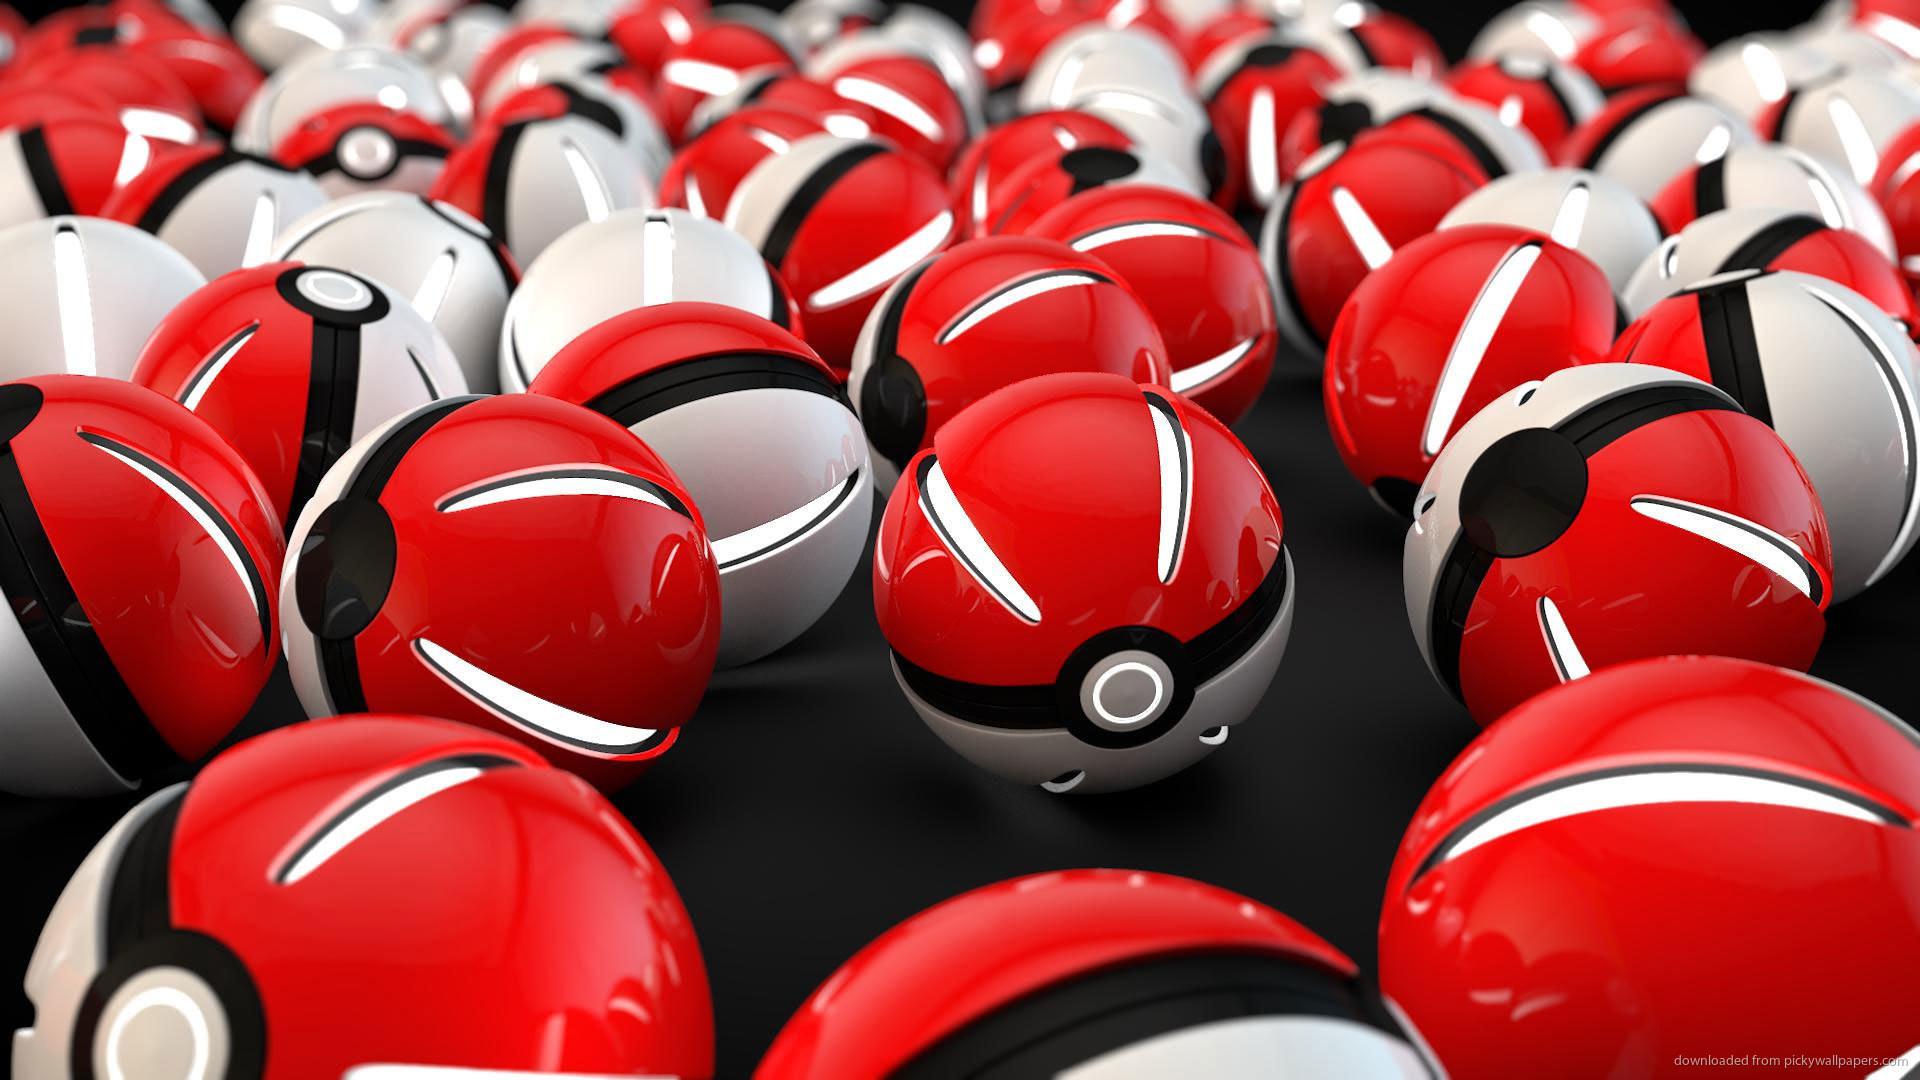 3D Pokemon Go Pokeball Wallpaper picture